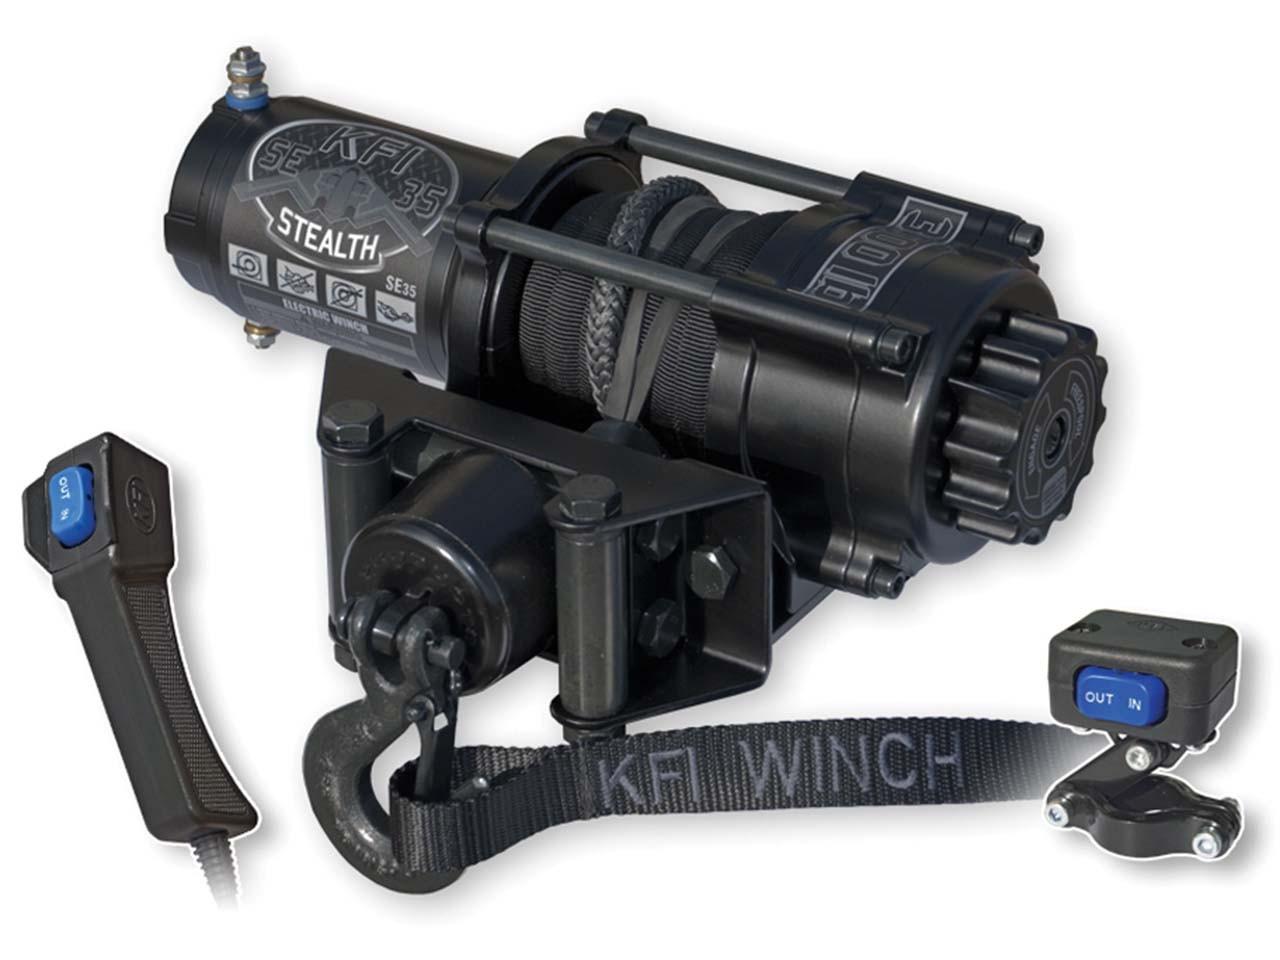 medium resolution of  kfi winch wiring diagram on polaris 4500 winch parts diagram superwinch 1500 wiring diagram